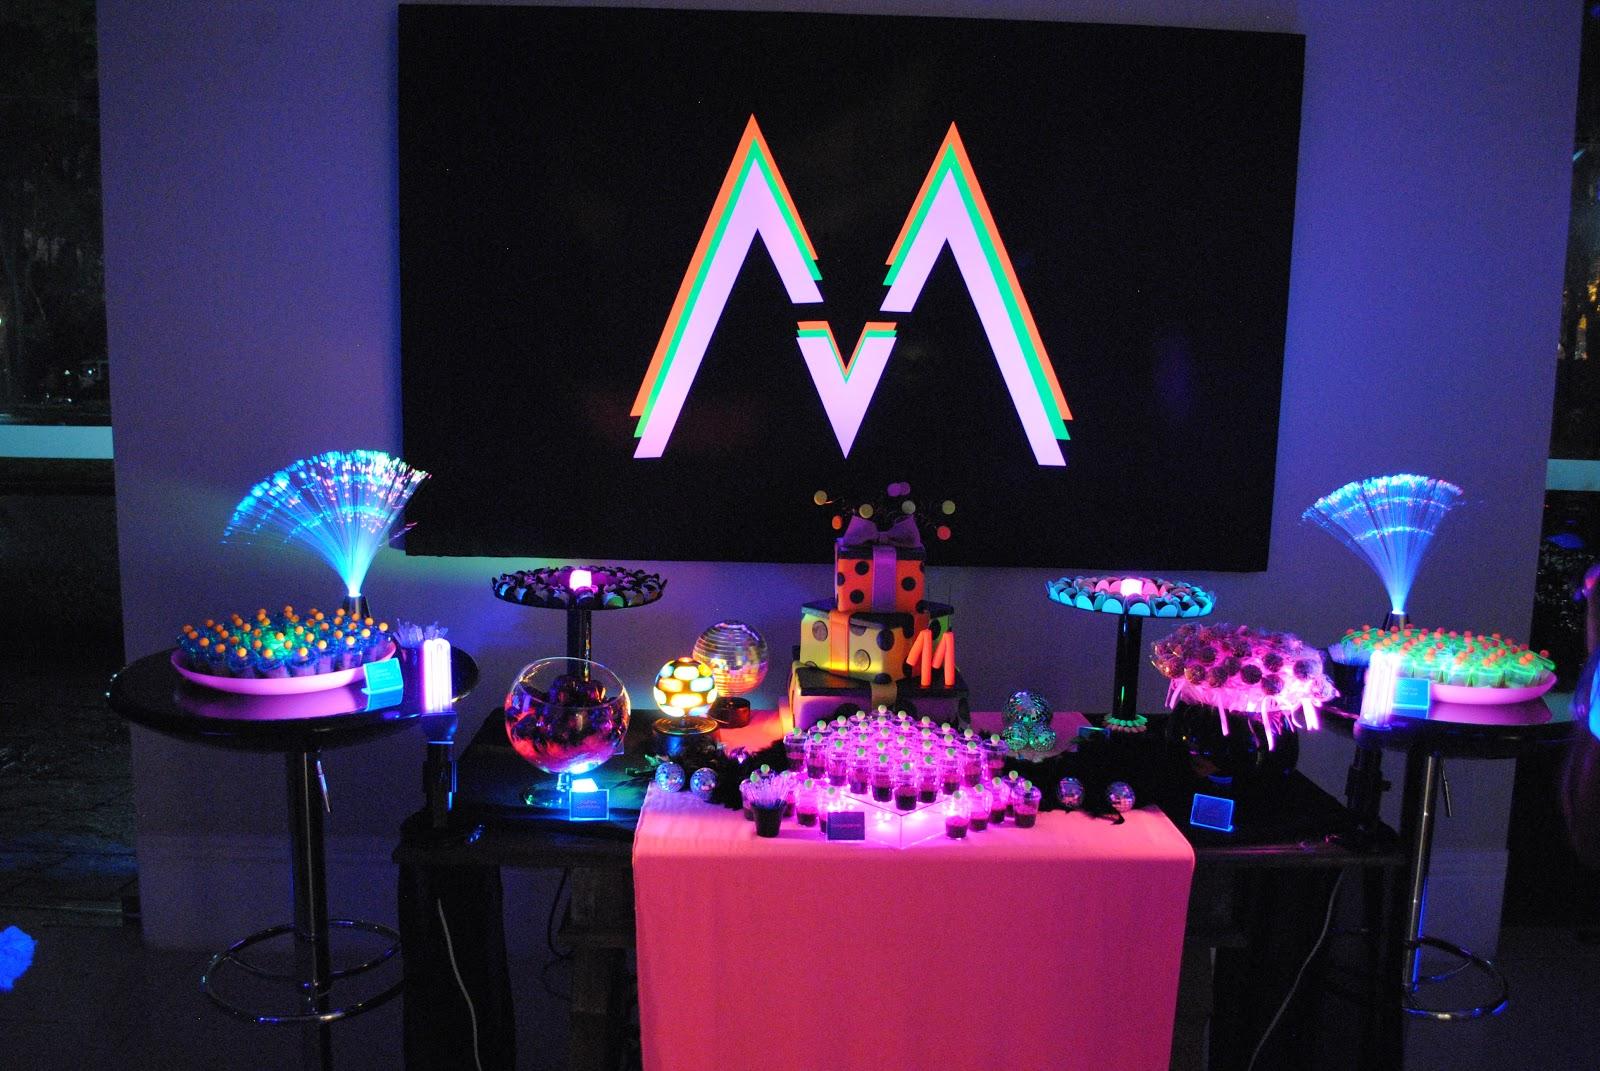 decoracao festa neon:mesa de lembrancinhas: kit manicure, cds e tubetes de goma